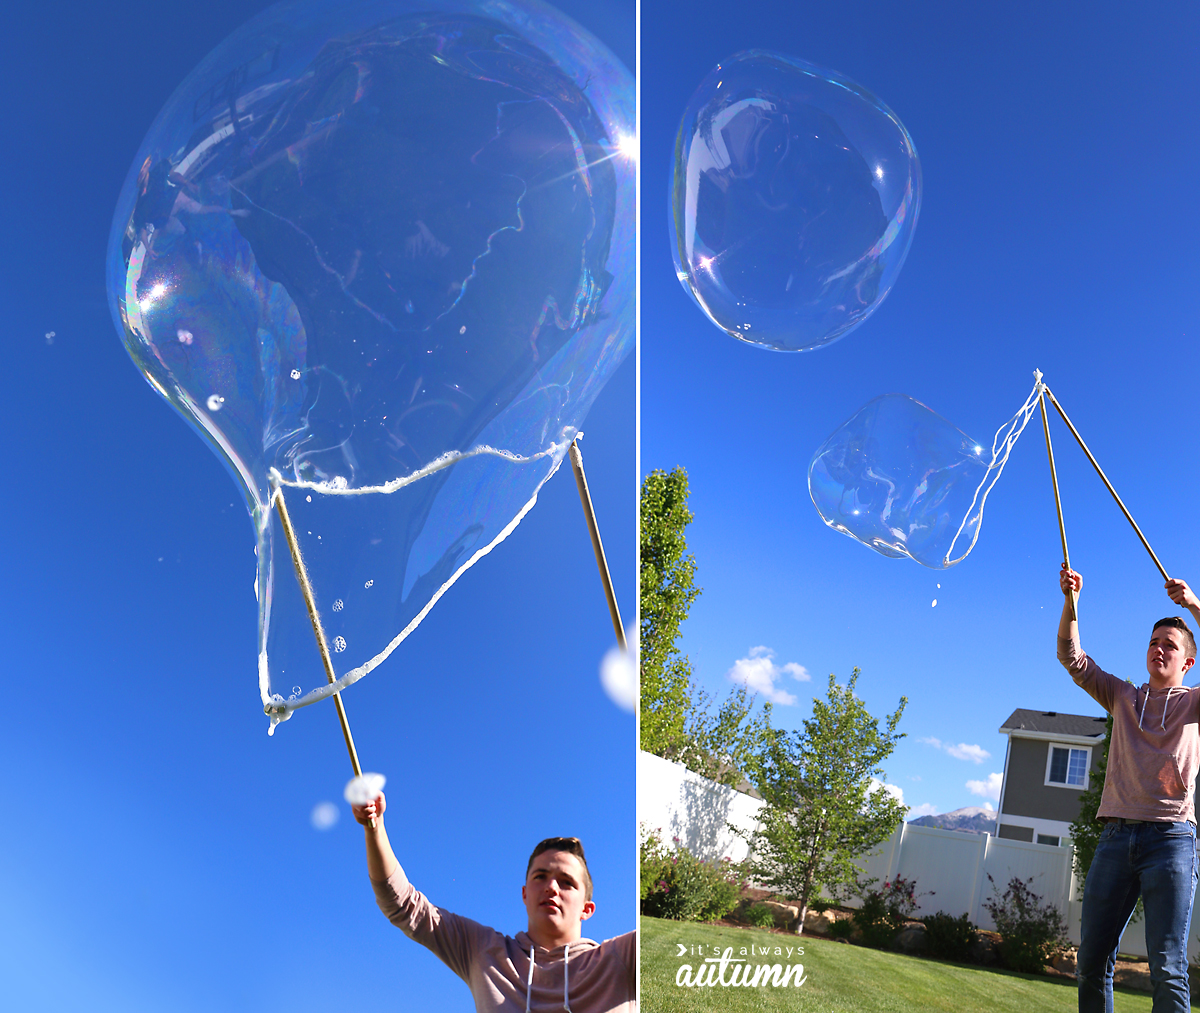 Boy blowing giant bubbles